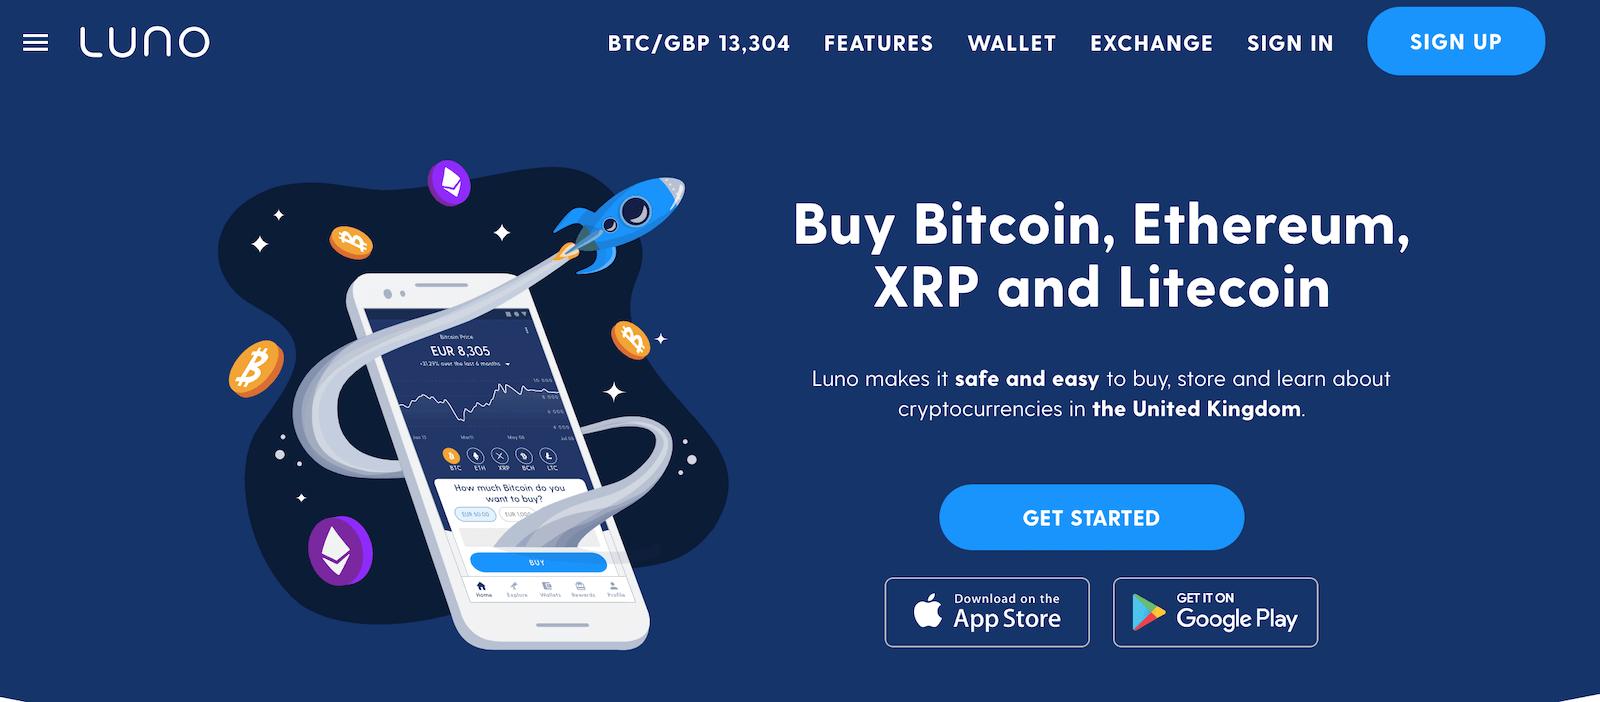 acquista bitcoin uk bank brussebal)